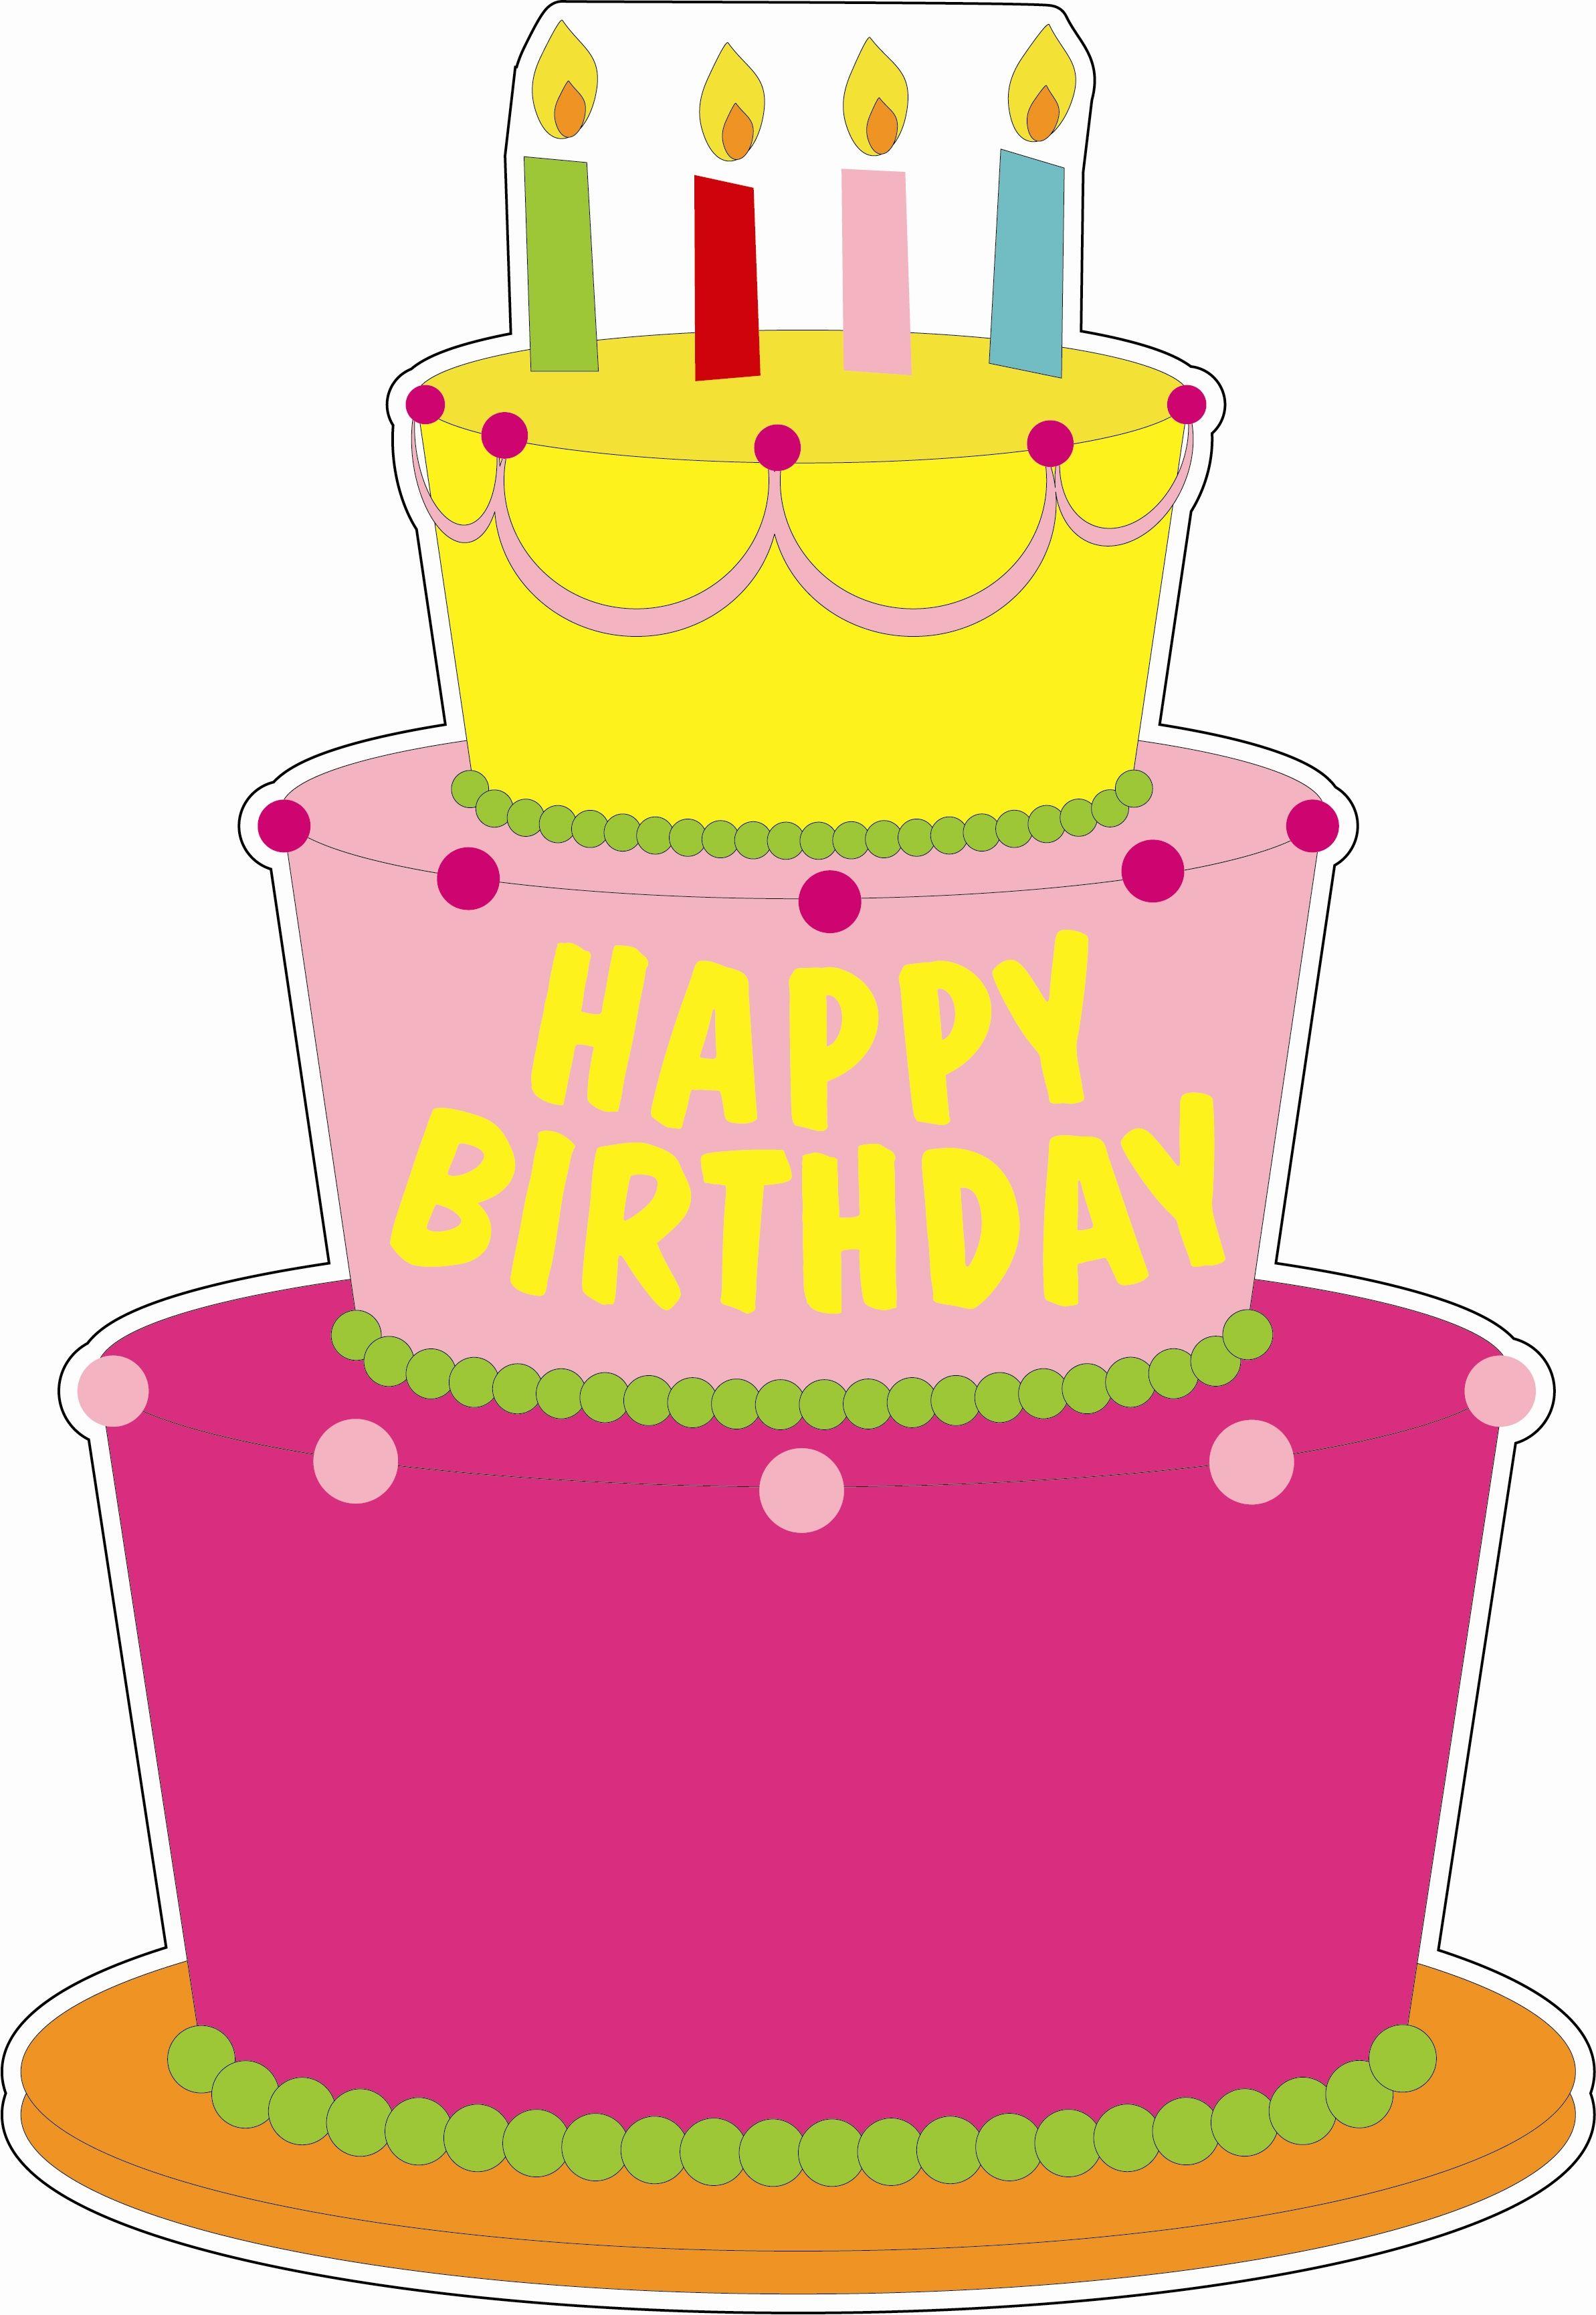 birthday cake cartoon Google Search Cartoon birthday